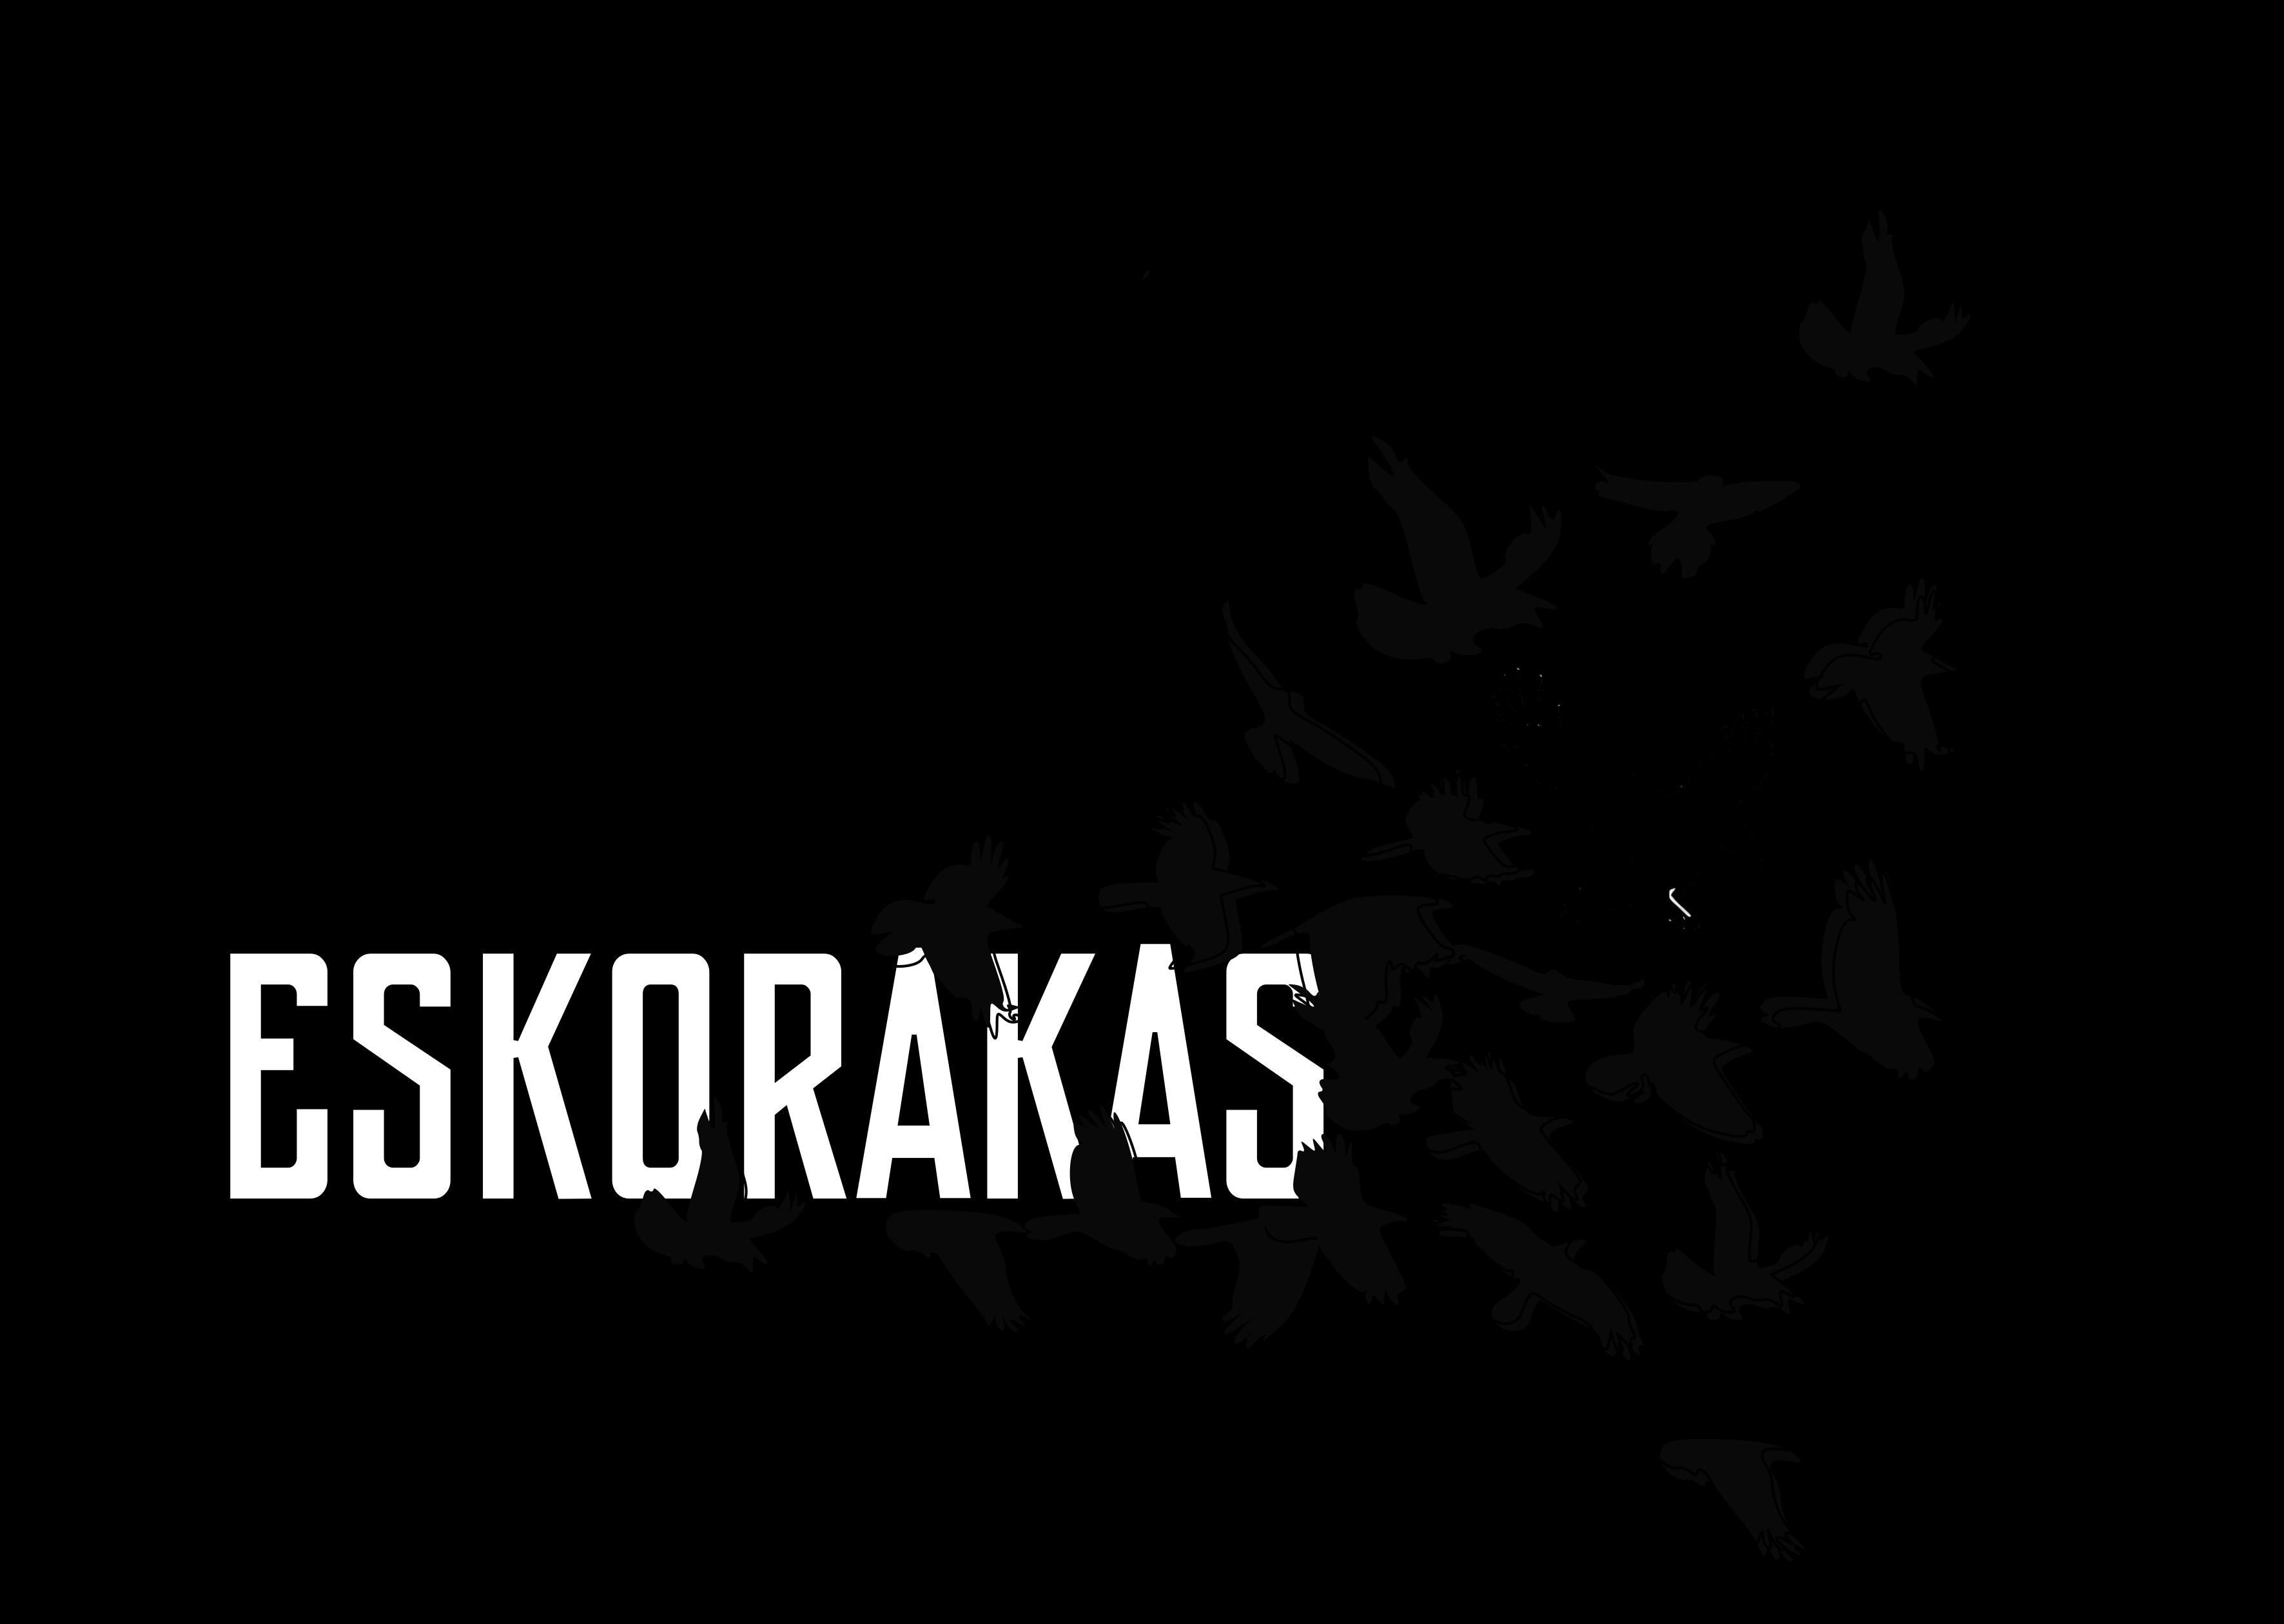 ESKORAKAS logo